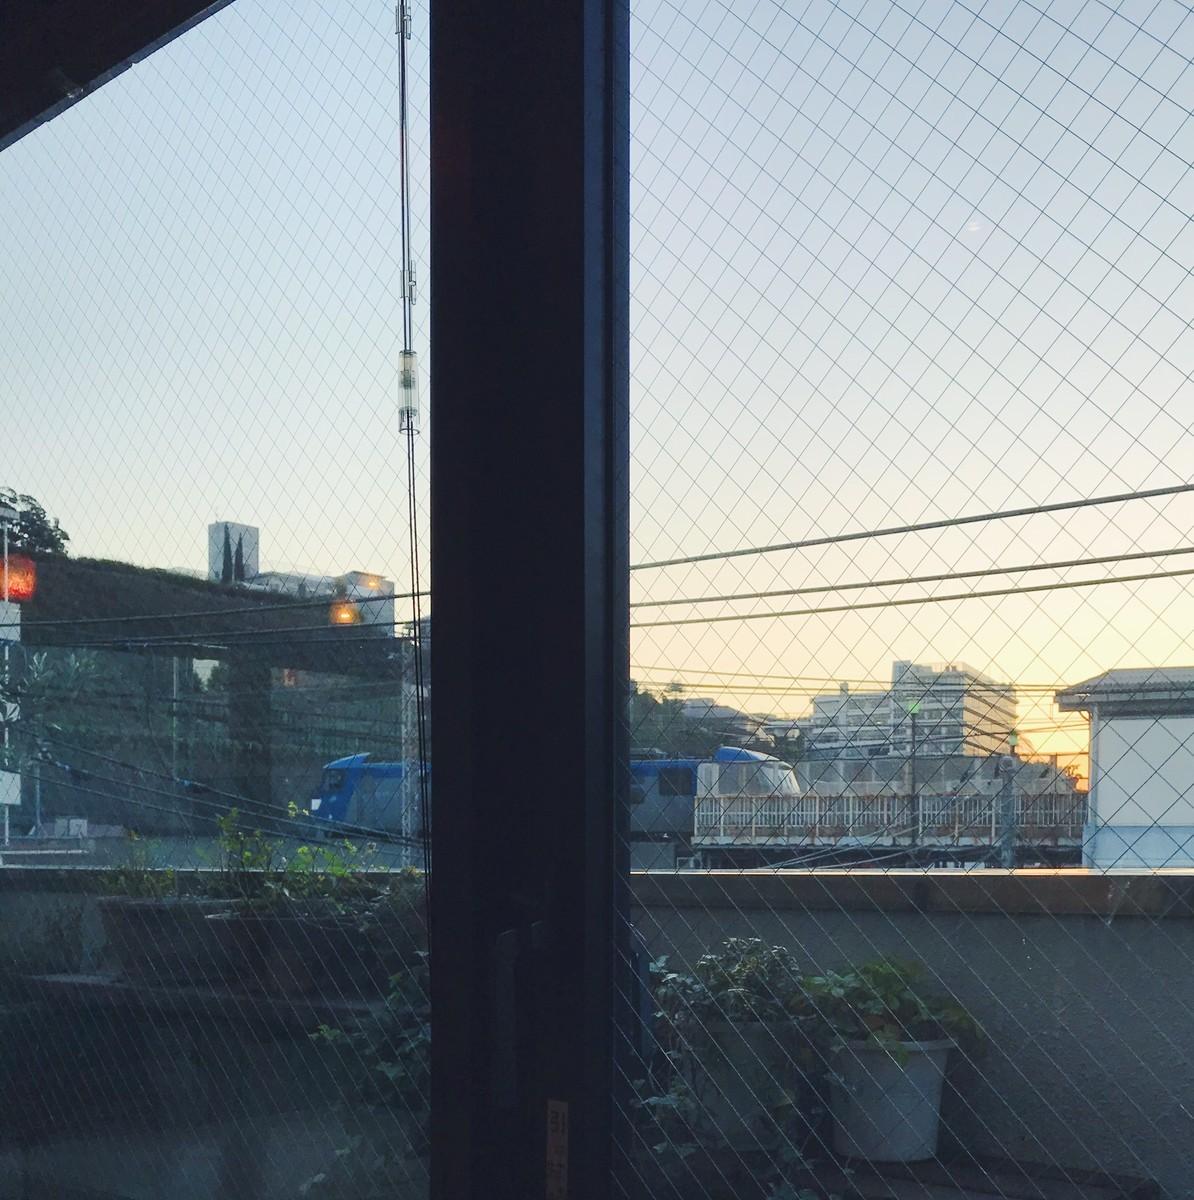 f:id:asacafe:20191211142706j:plain